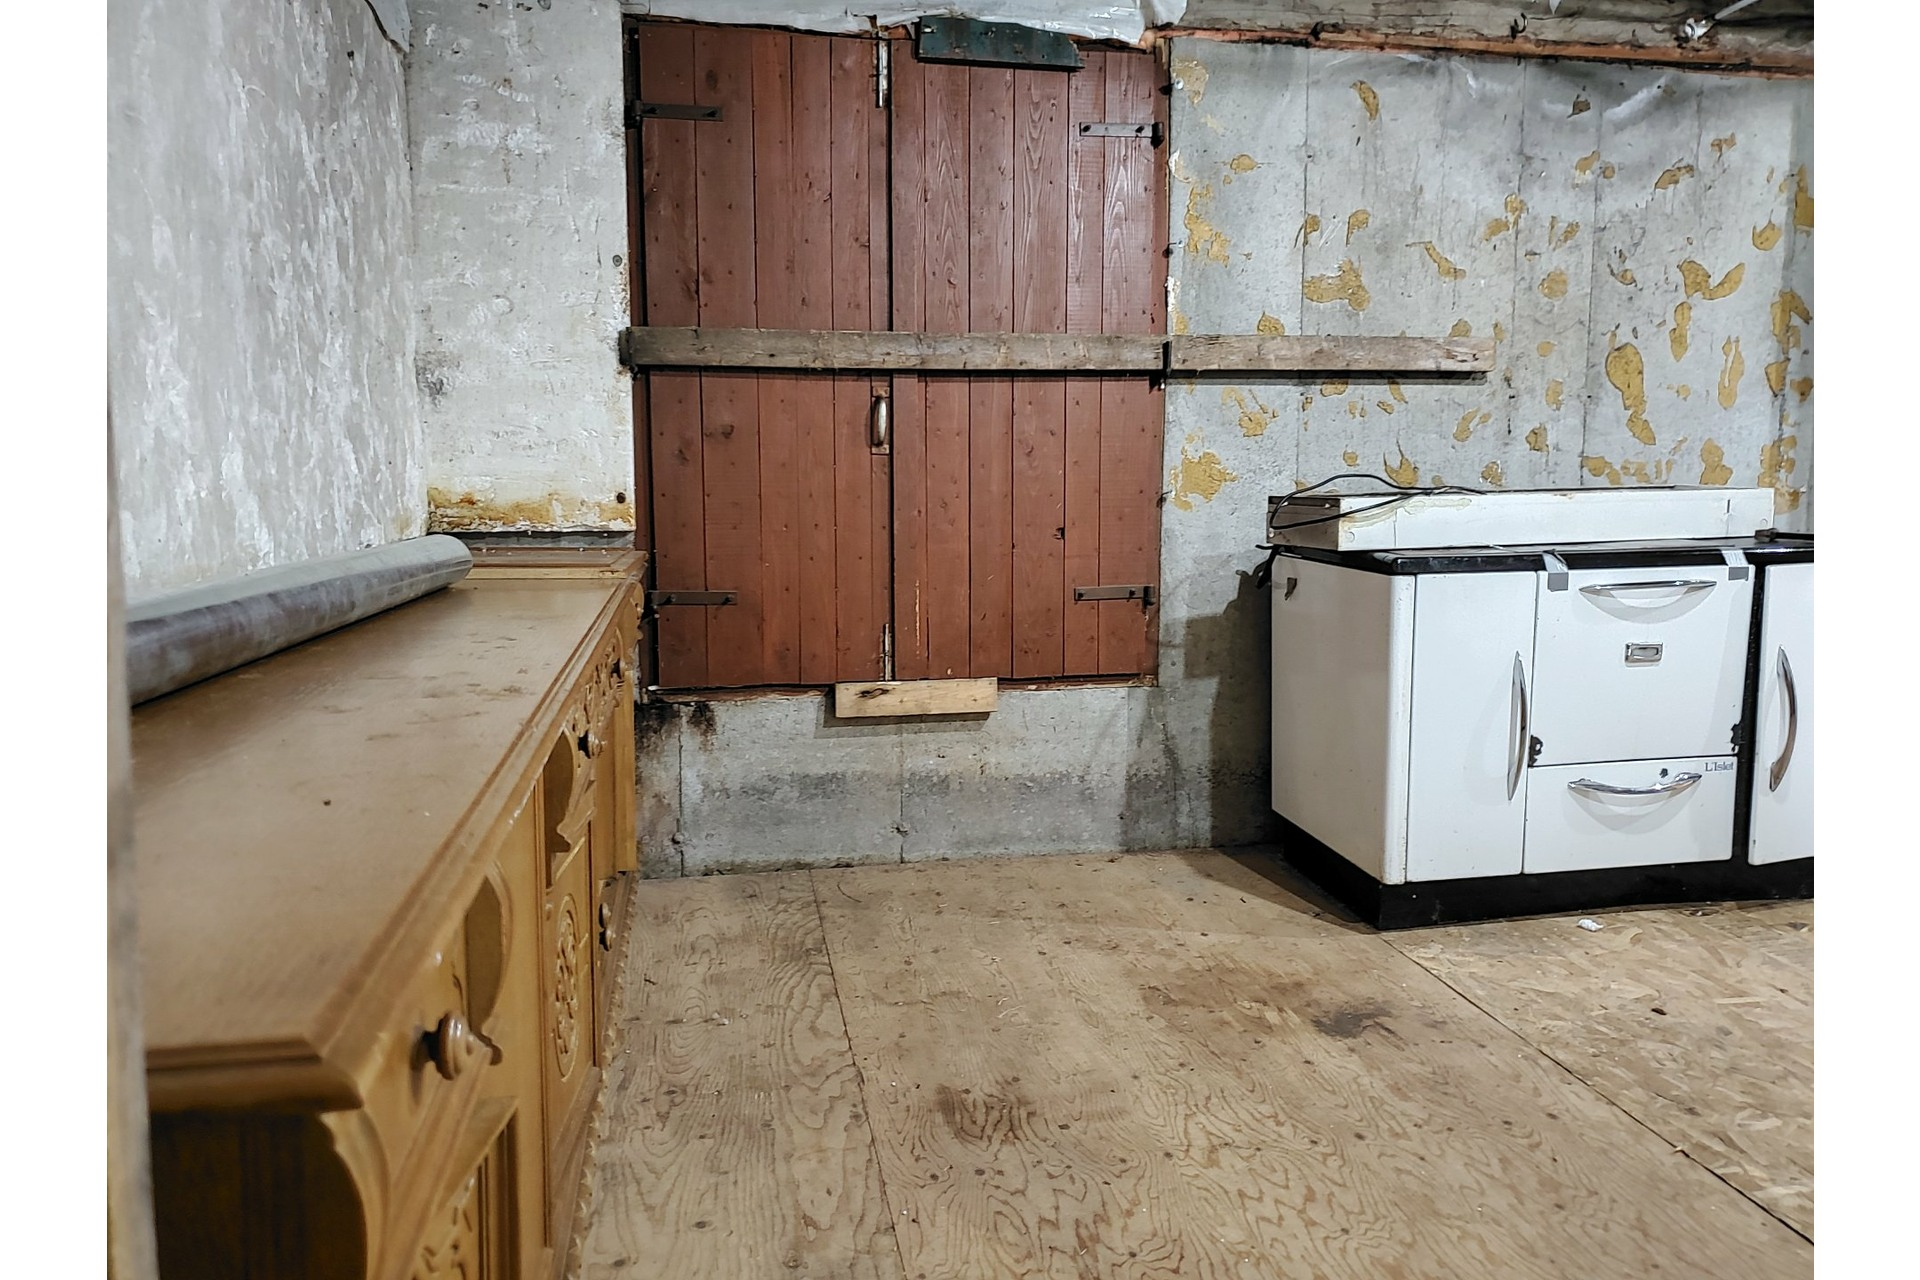 image 27 - Farmhouse For sale Sainte-Marie-de-Blandford - 10 rooms